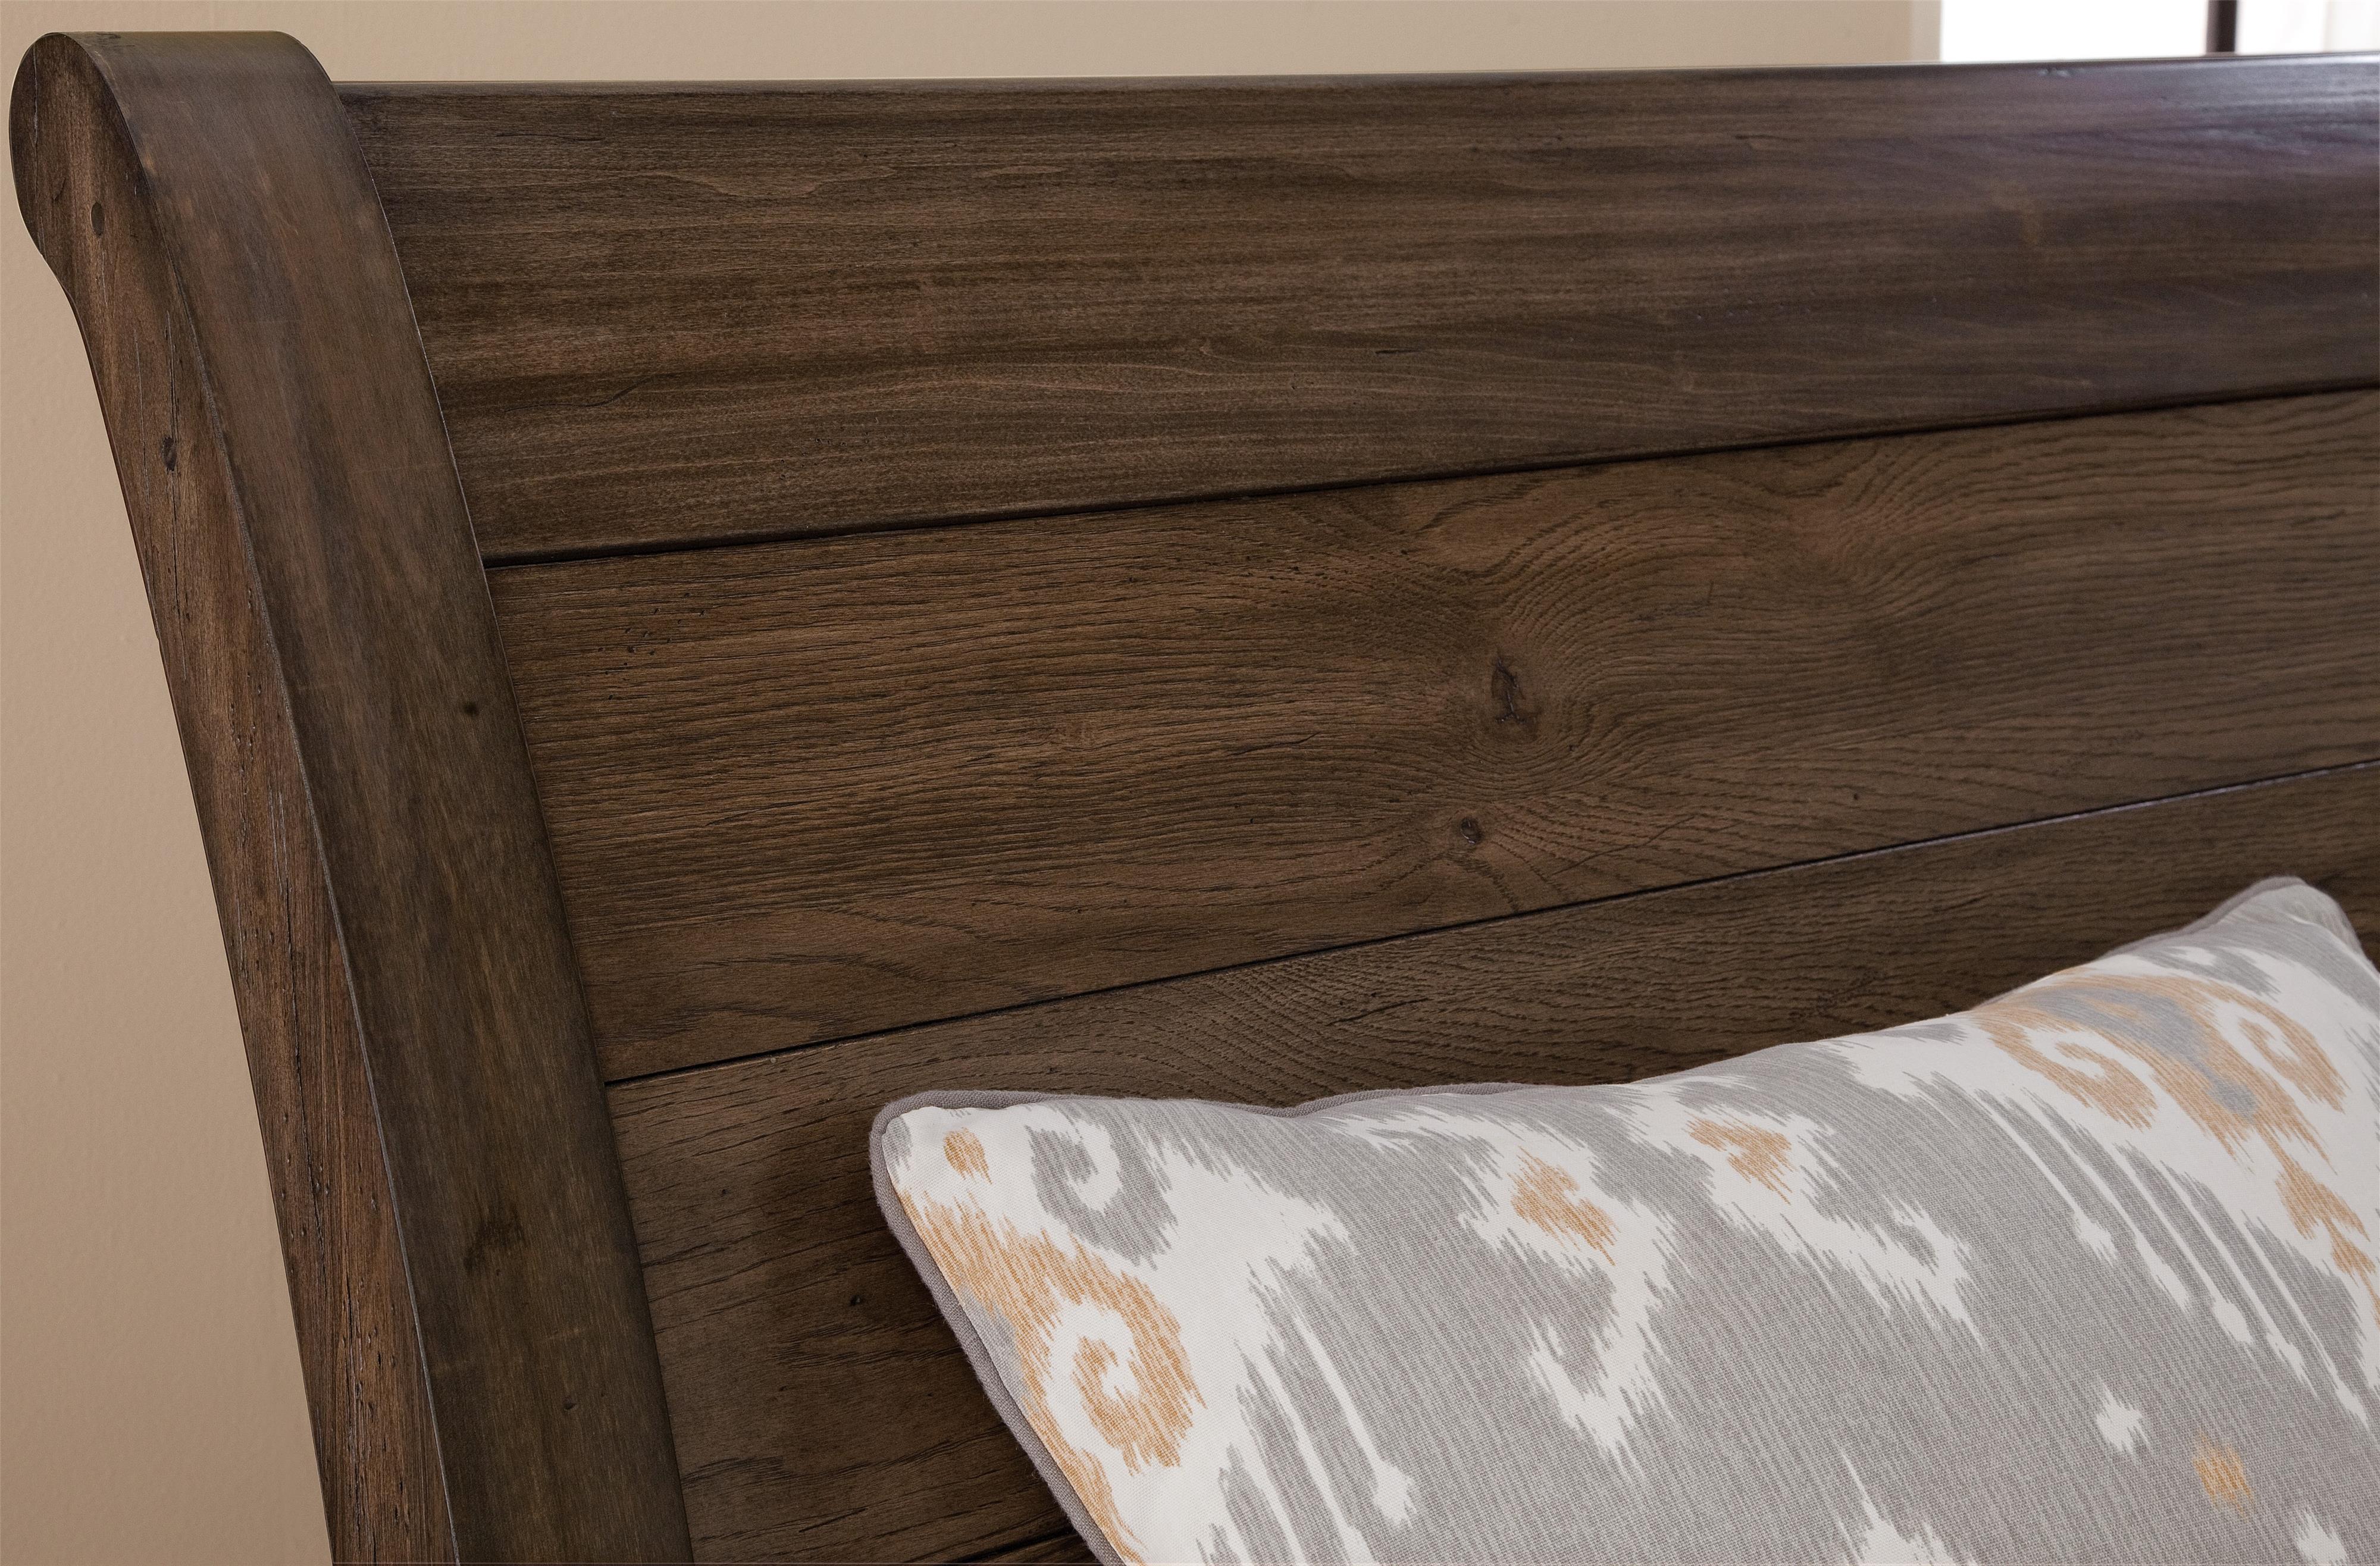 Vaughan Bassett Whiskey Barrel Distressed Queen Sleigh Bed